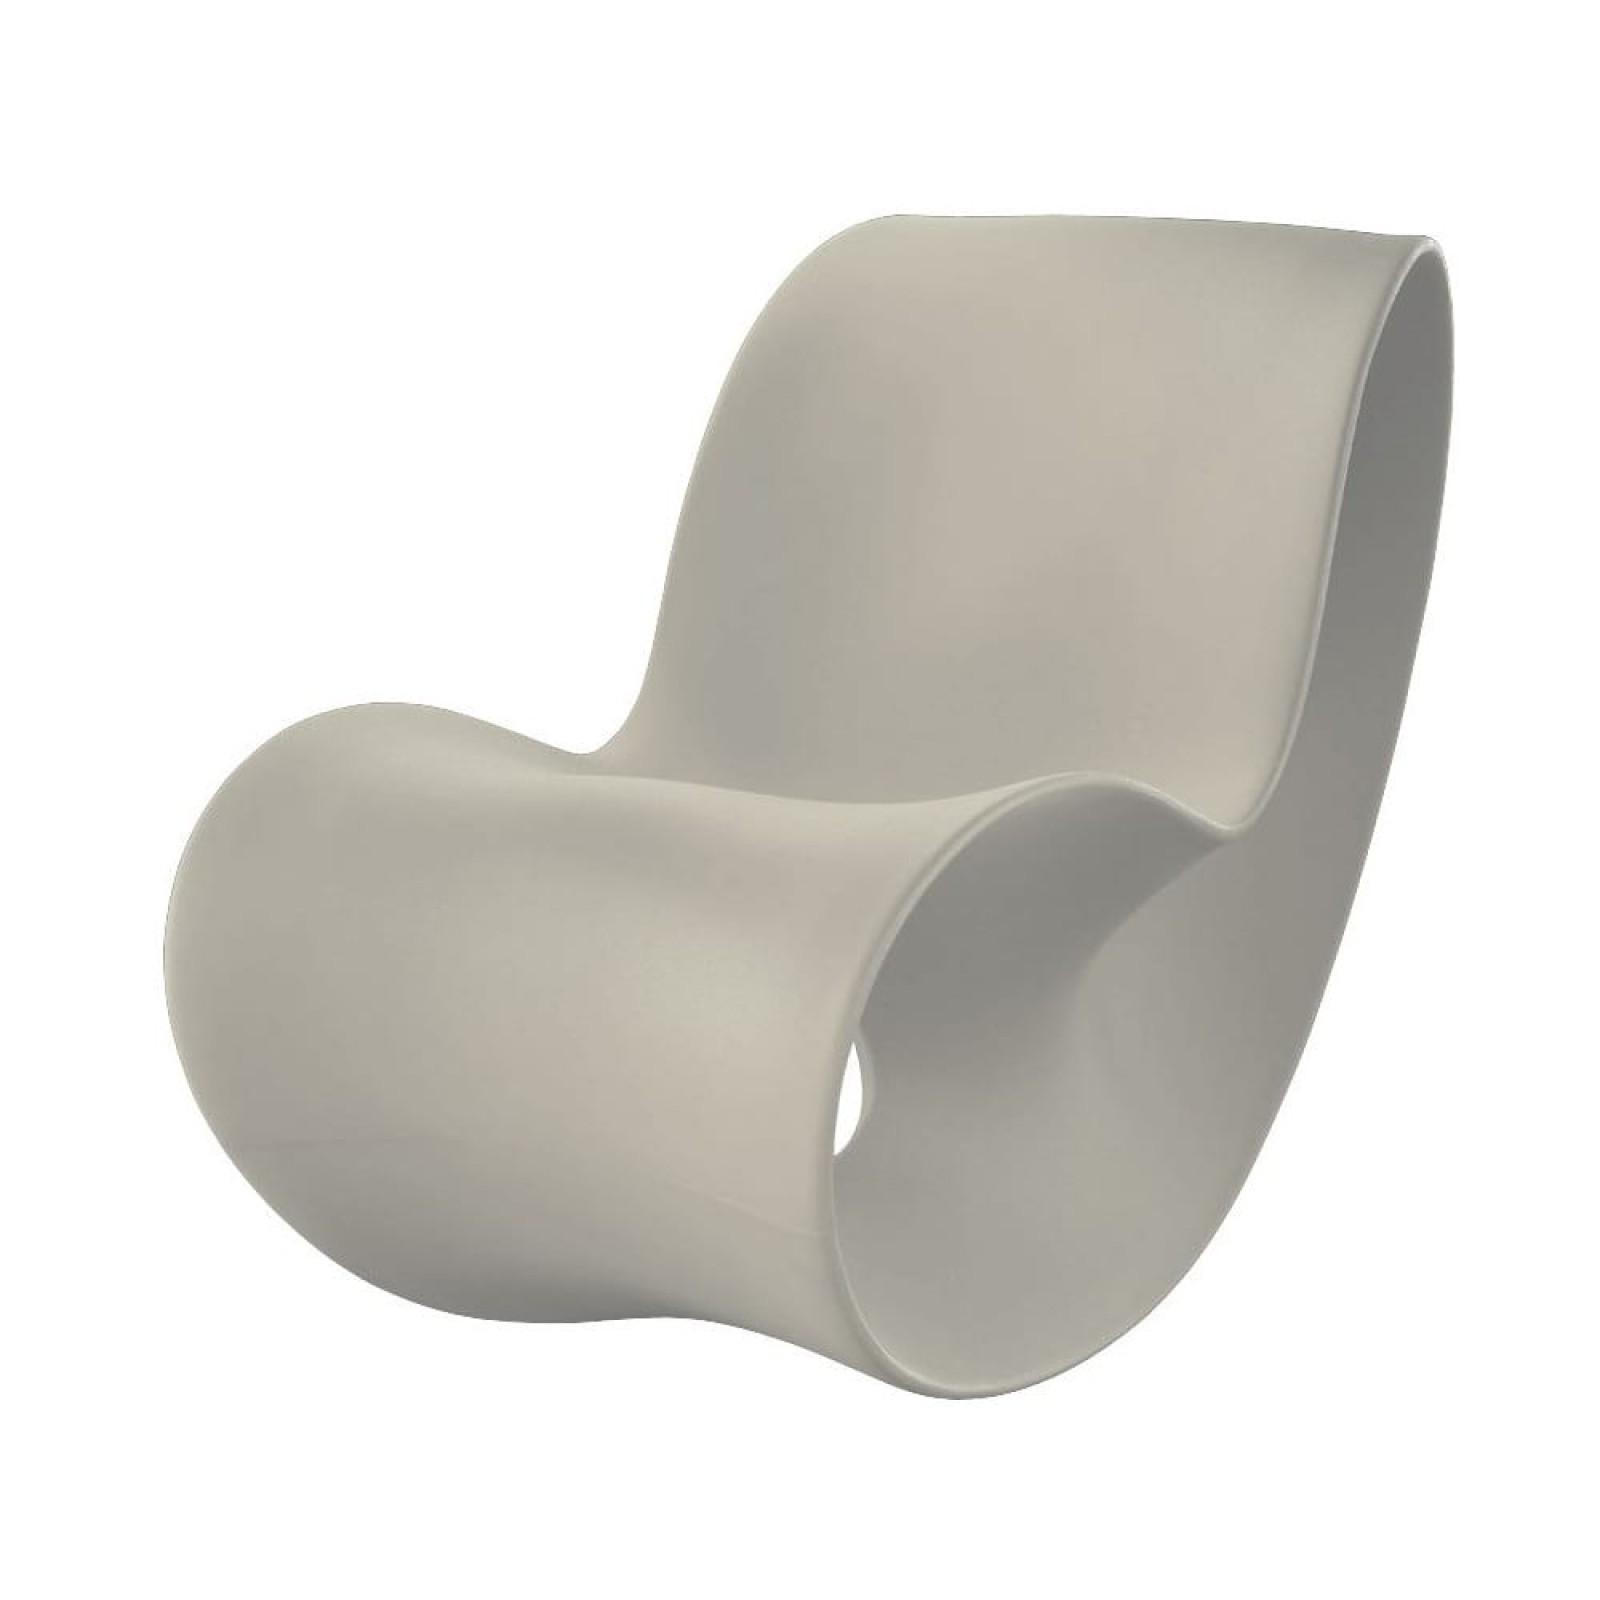 Voido Rocking Chair (Light Grey) - Magis